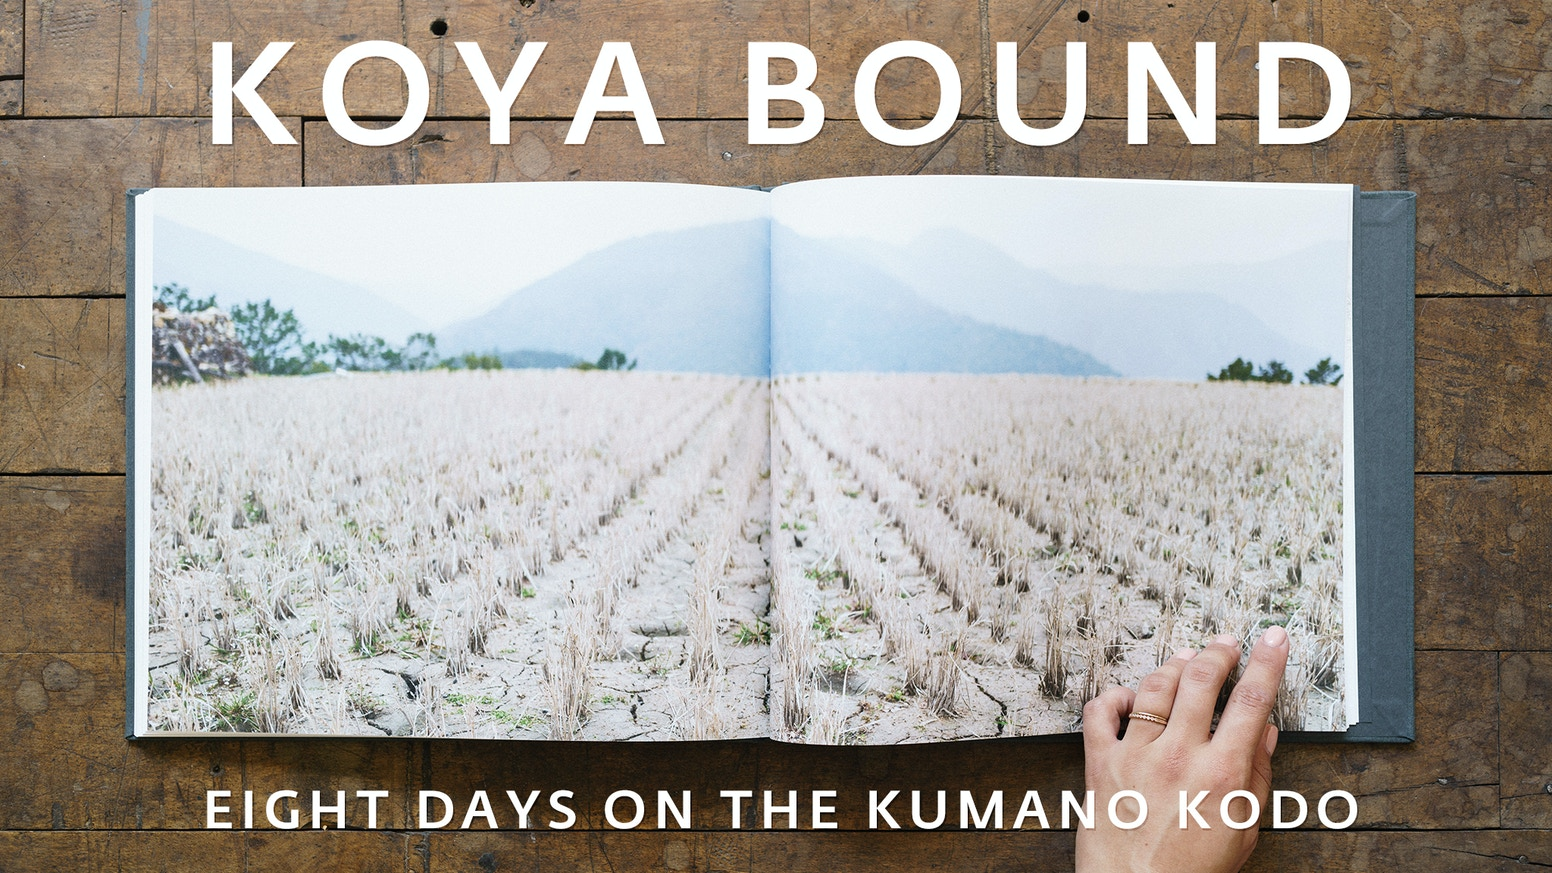 Koya Bound: A book of photography from Japan's Kumano Kodo world heritage pilgrimage walk.